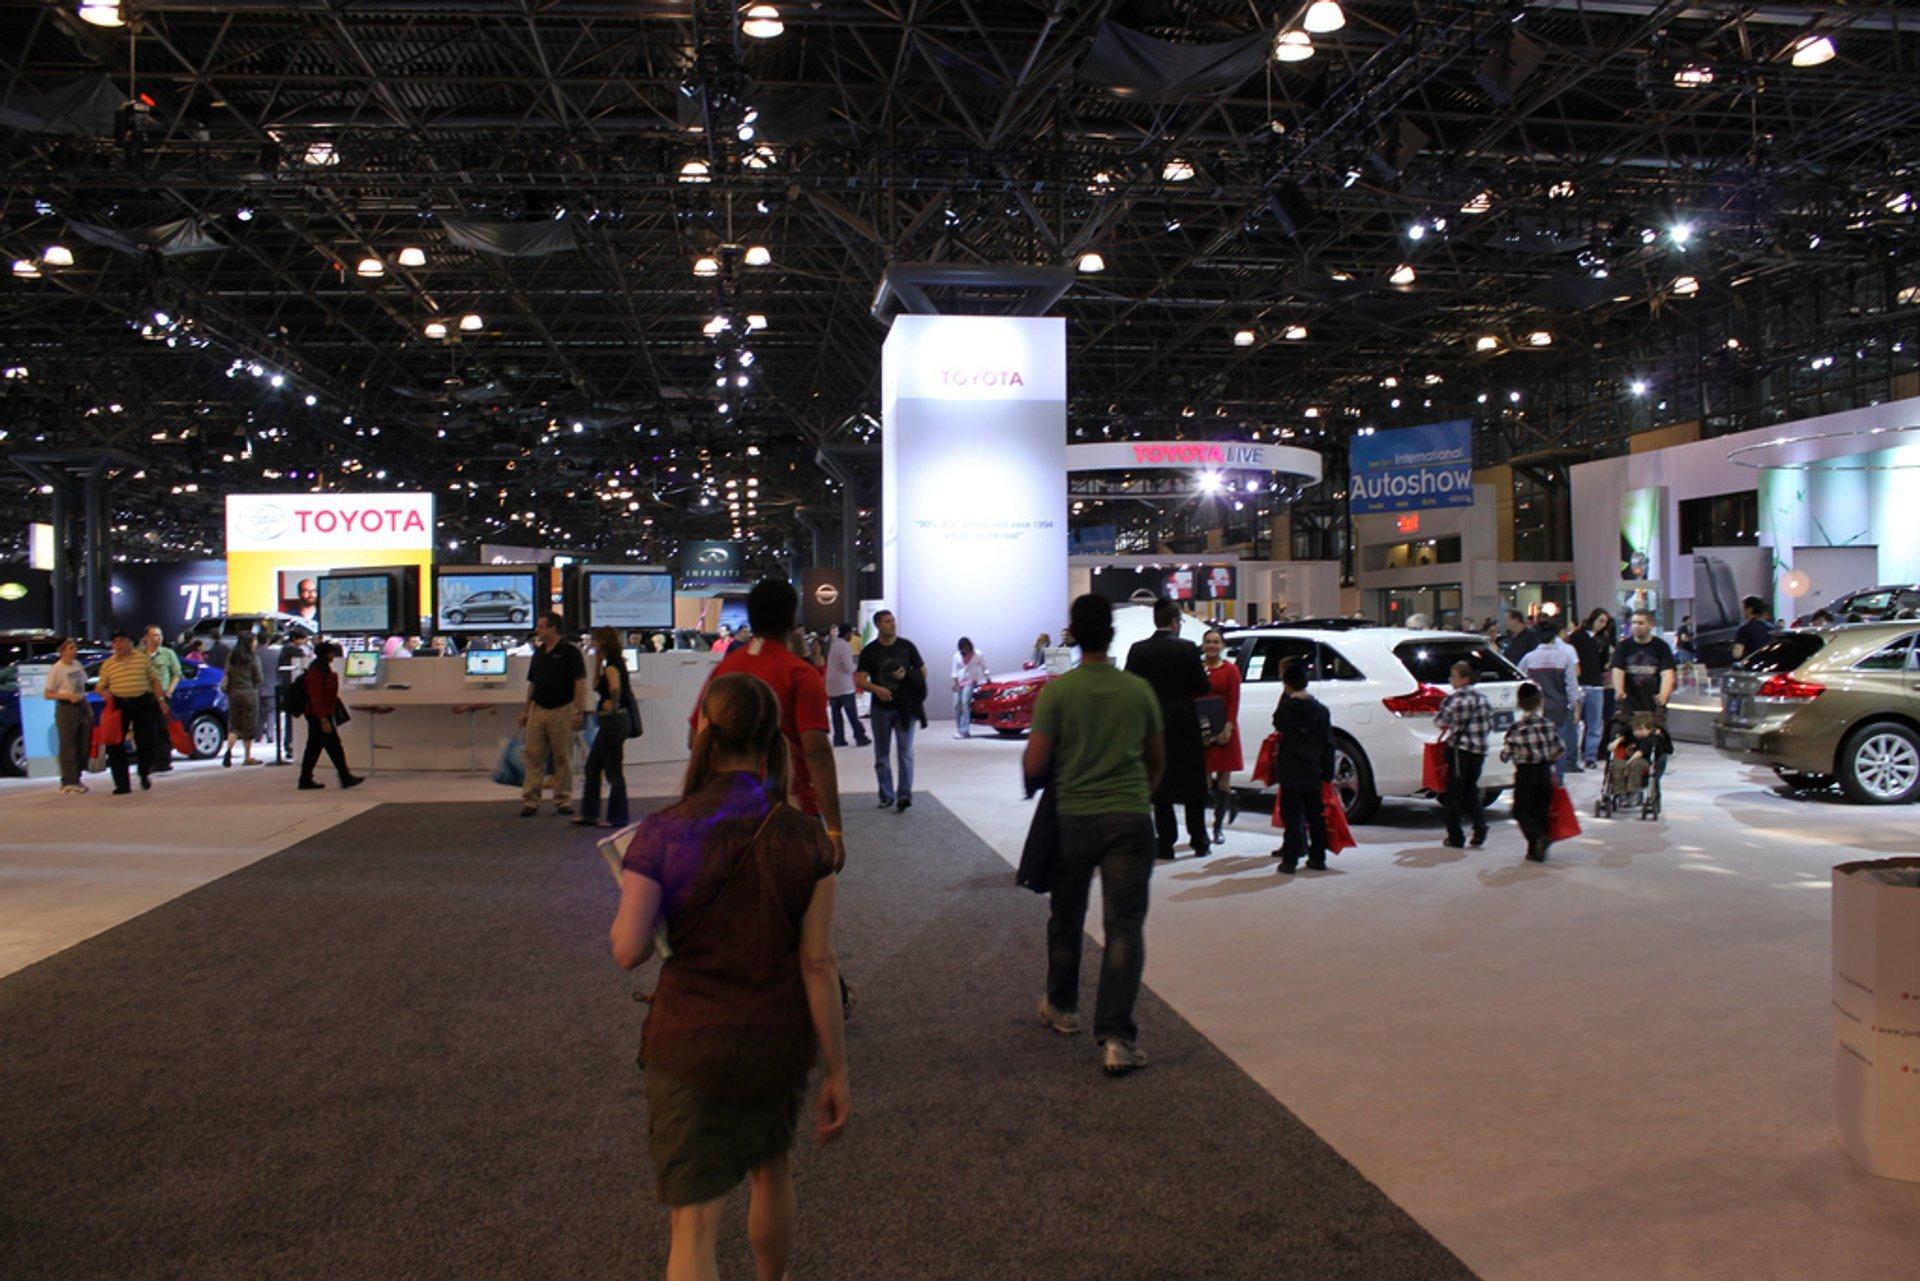 New York International Auto Show in New York - Best Season 2020